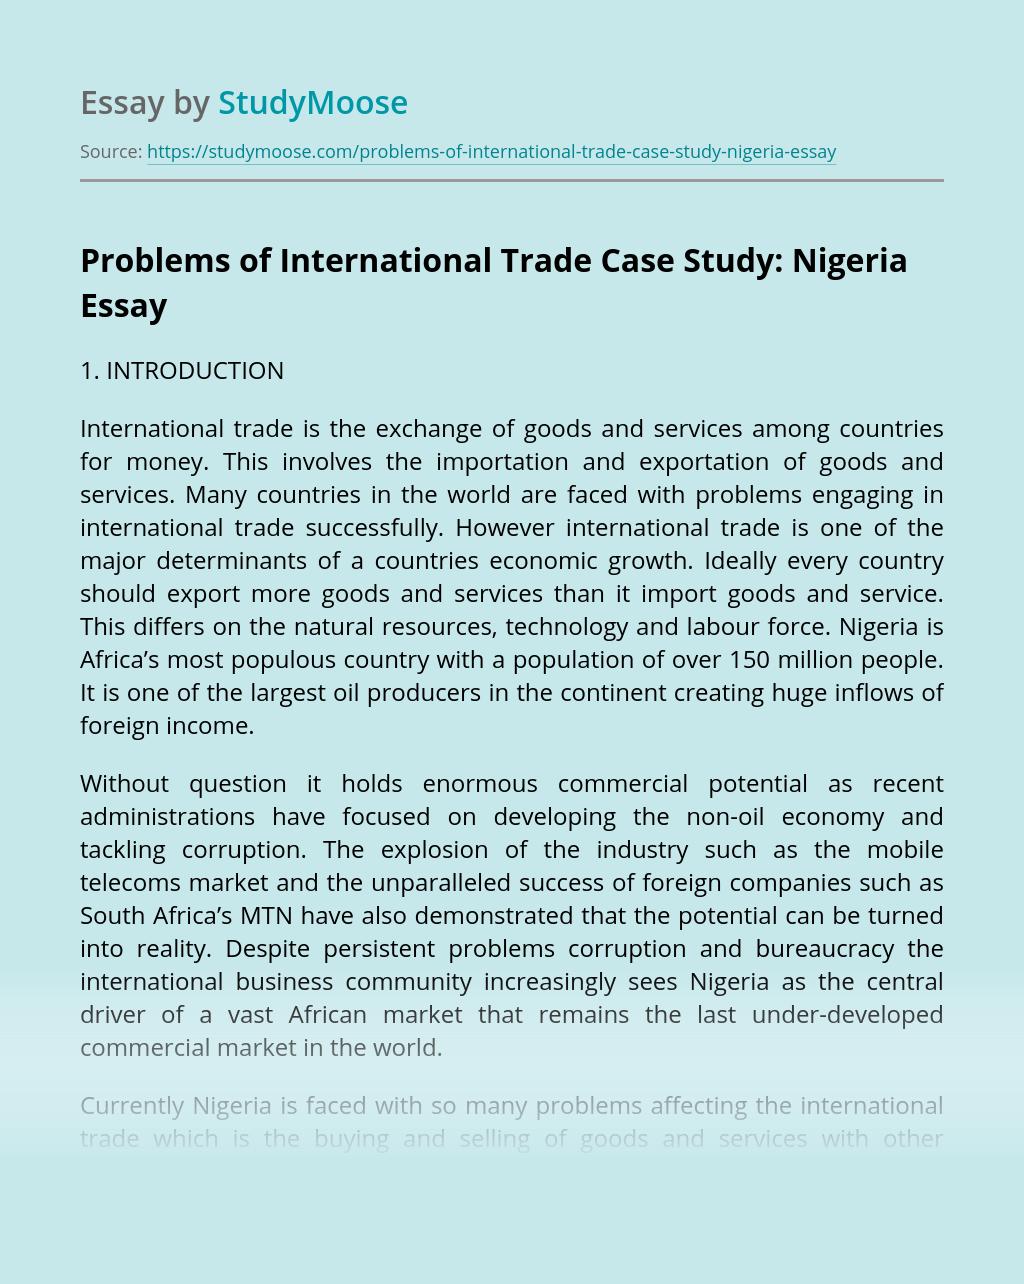 Problems of International Trade Case Study: Nigeria